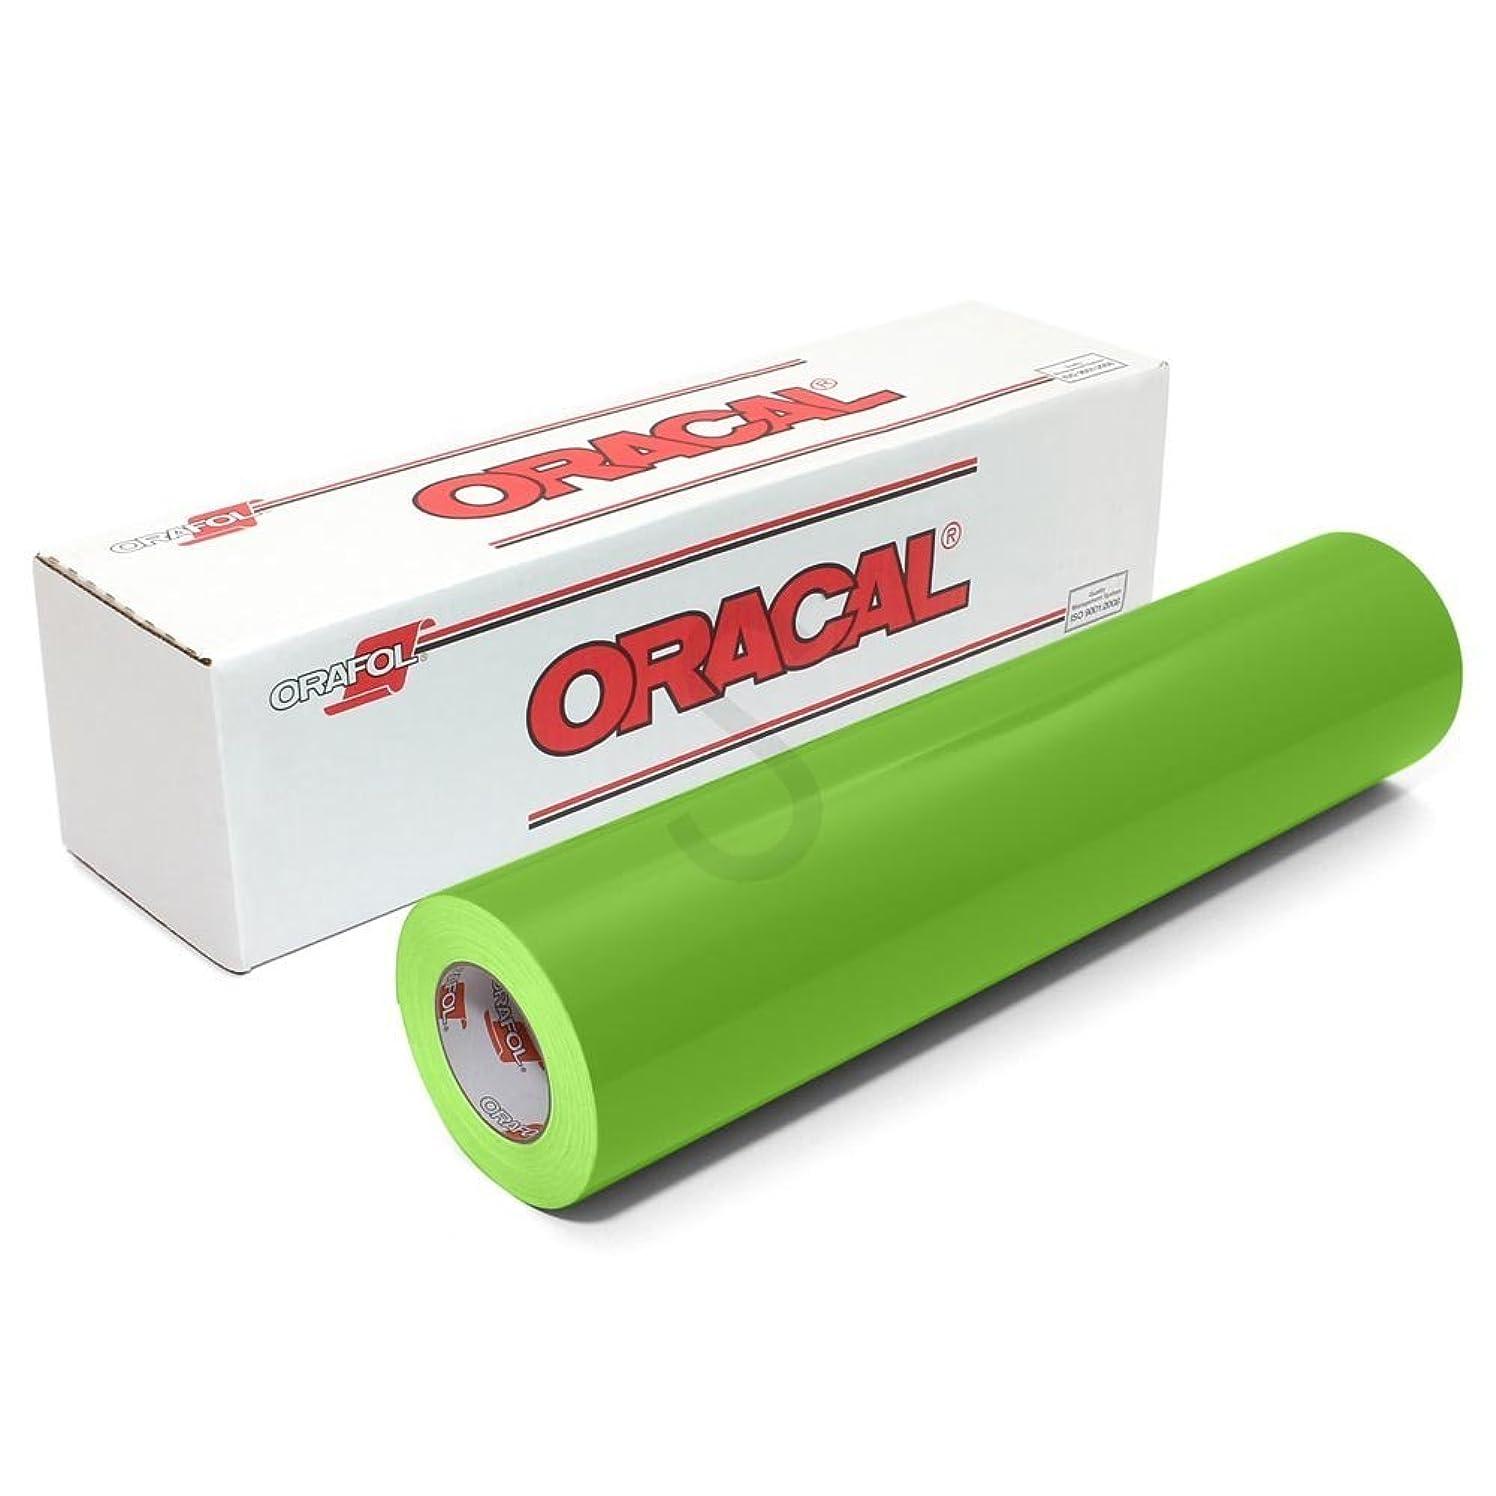 Oracal 651 Glossy Permanent Vinyl 12 Inch x 6 Feet - Limetree Green